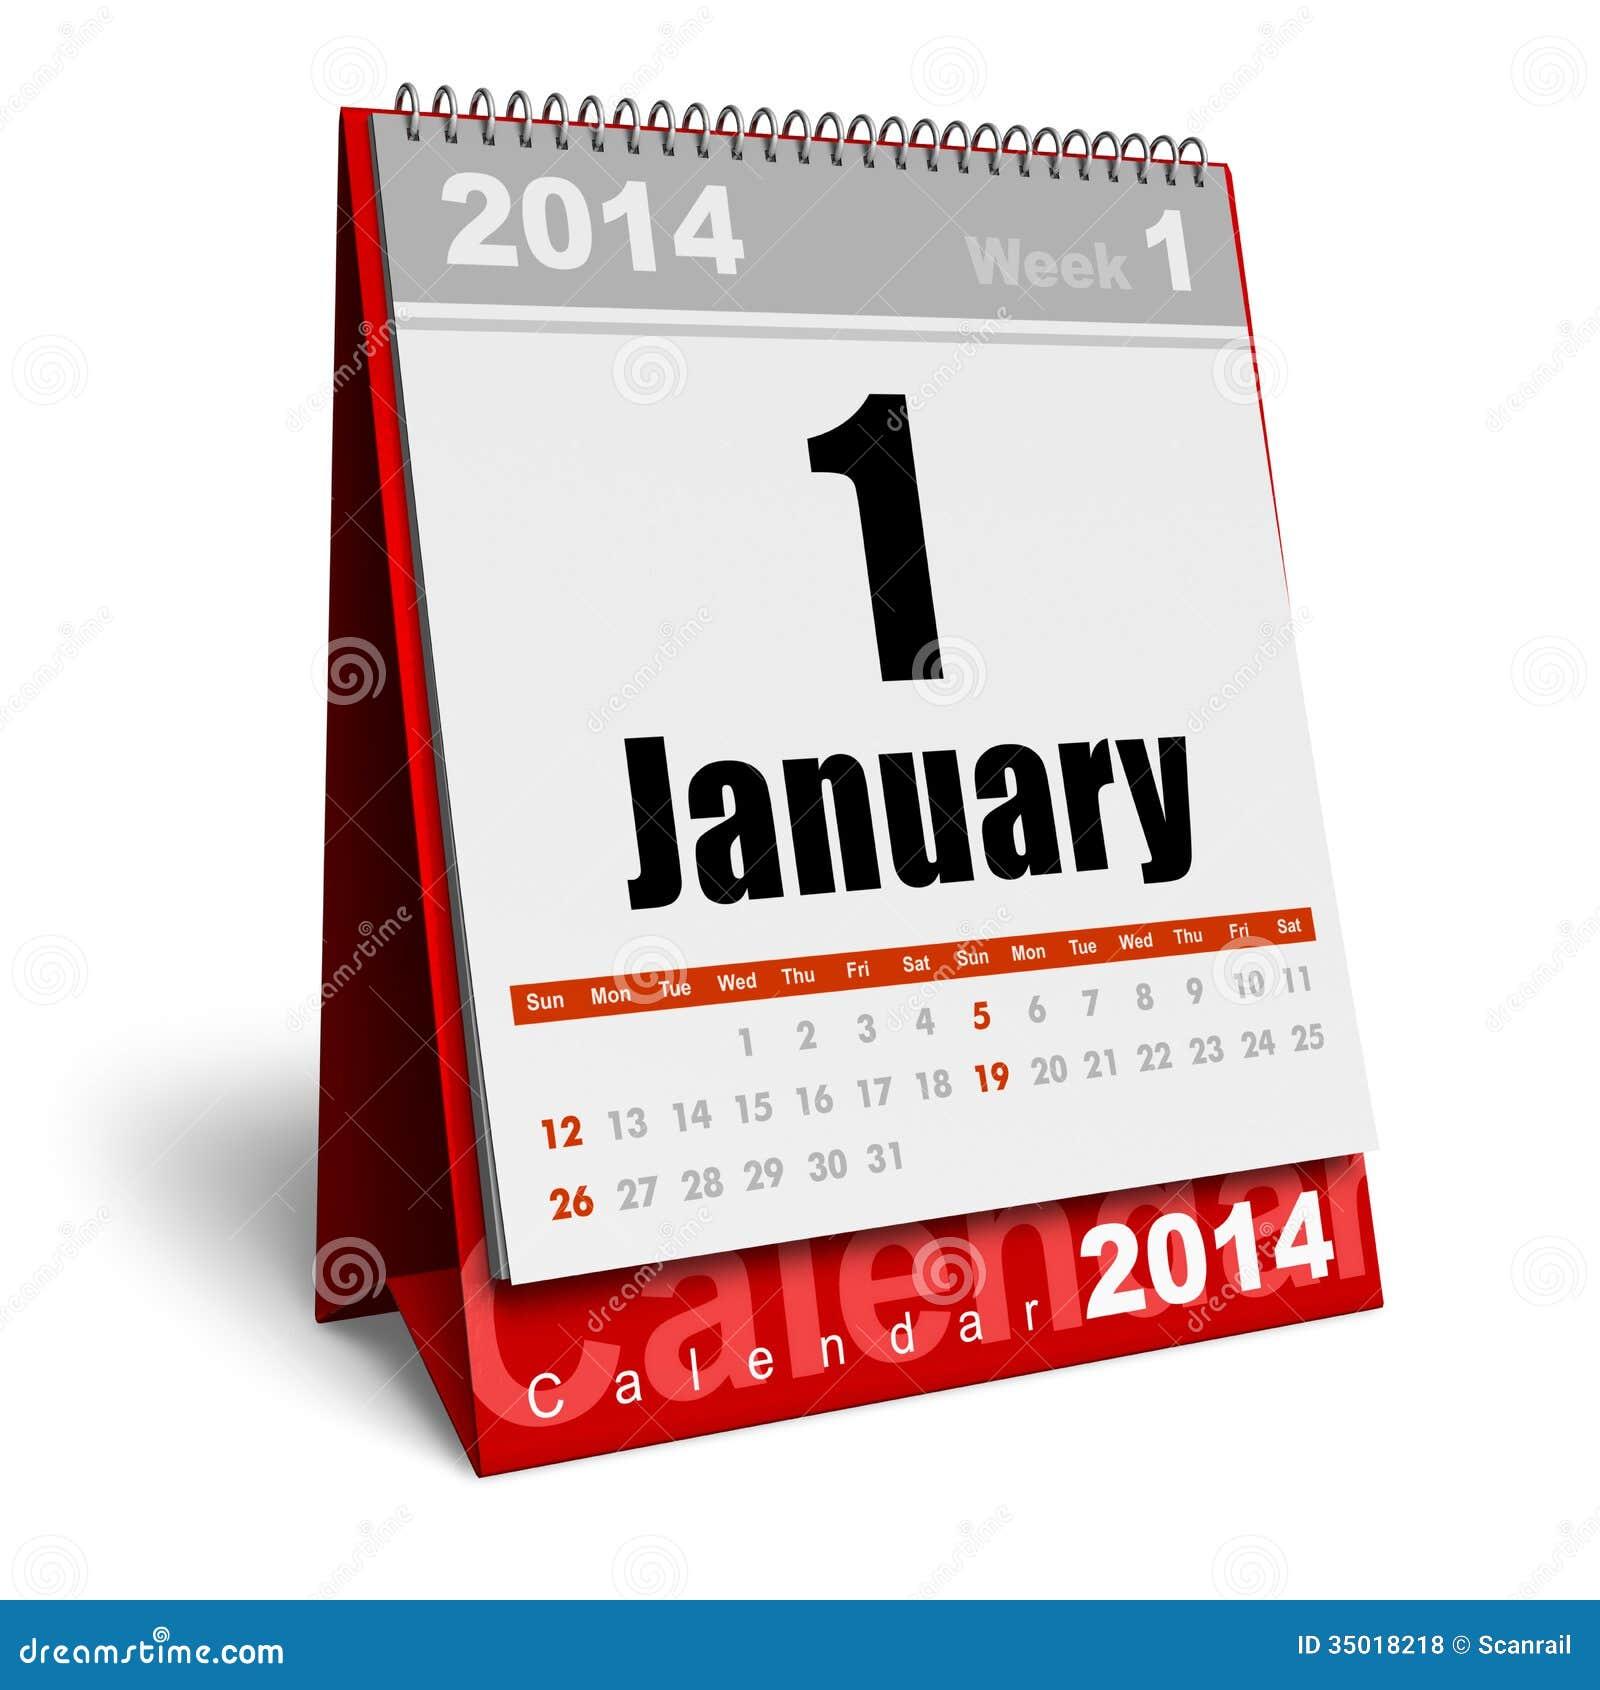 January 2014 Calendar Royalty Free Photos Image 35018218 – Free Office Calendar